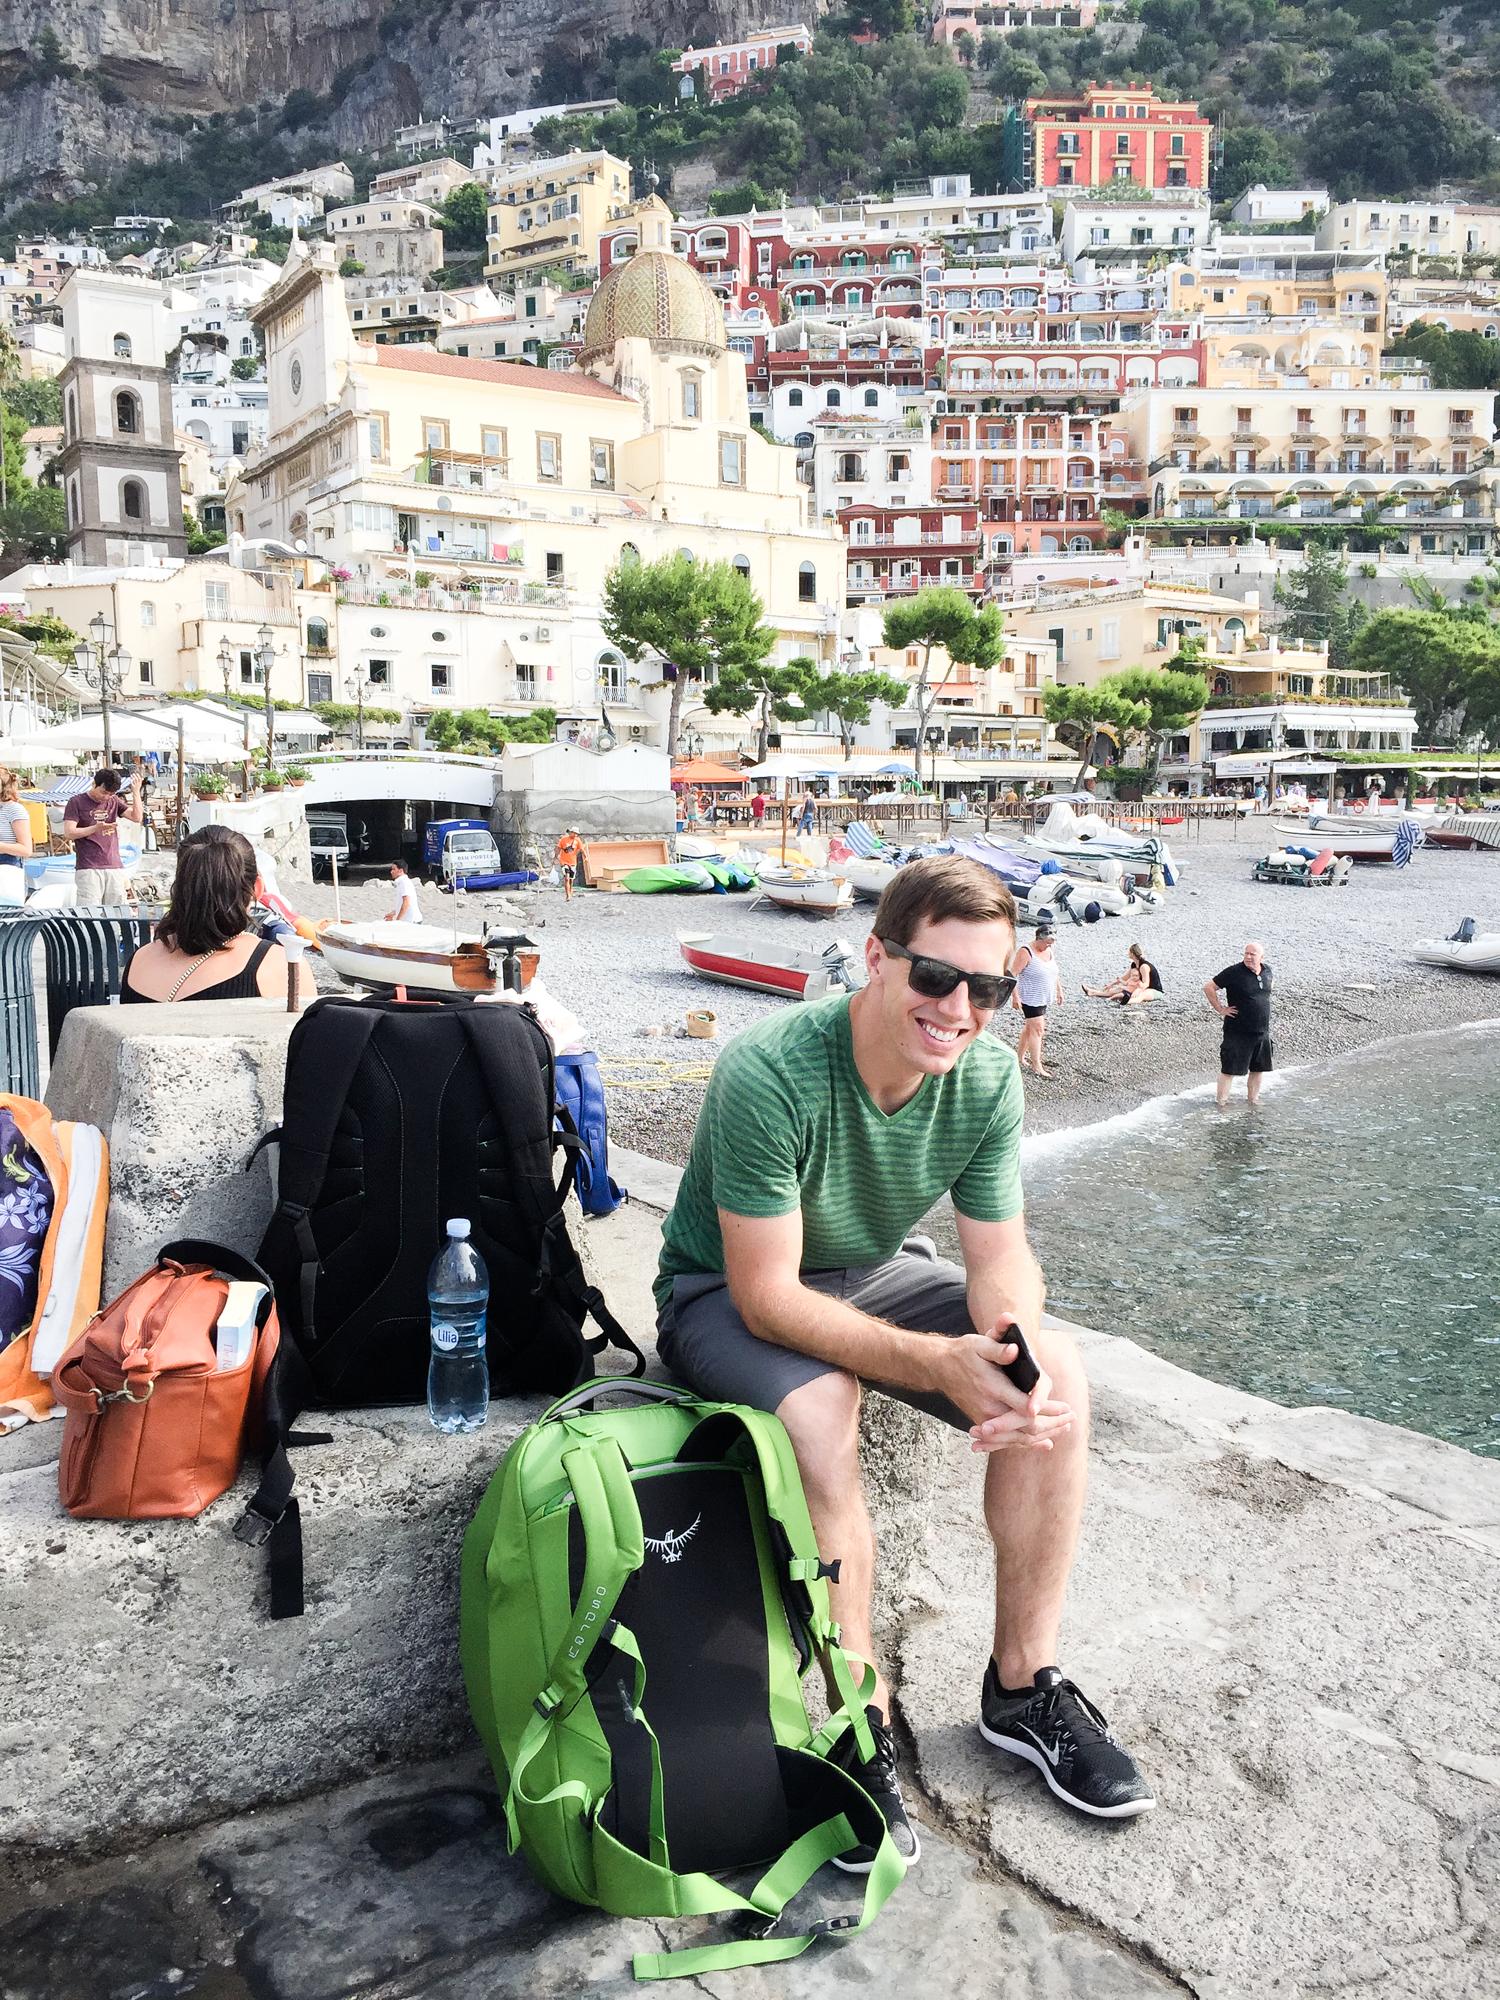 Leaving Positano